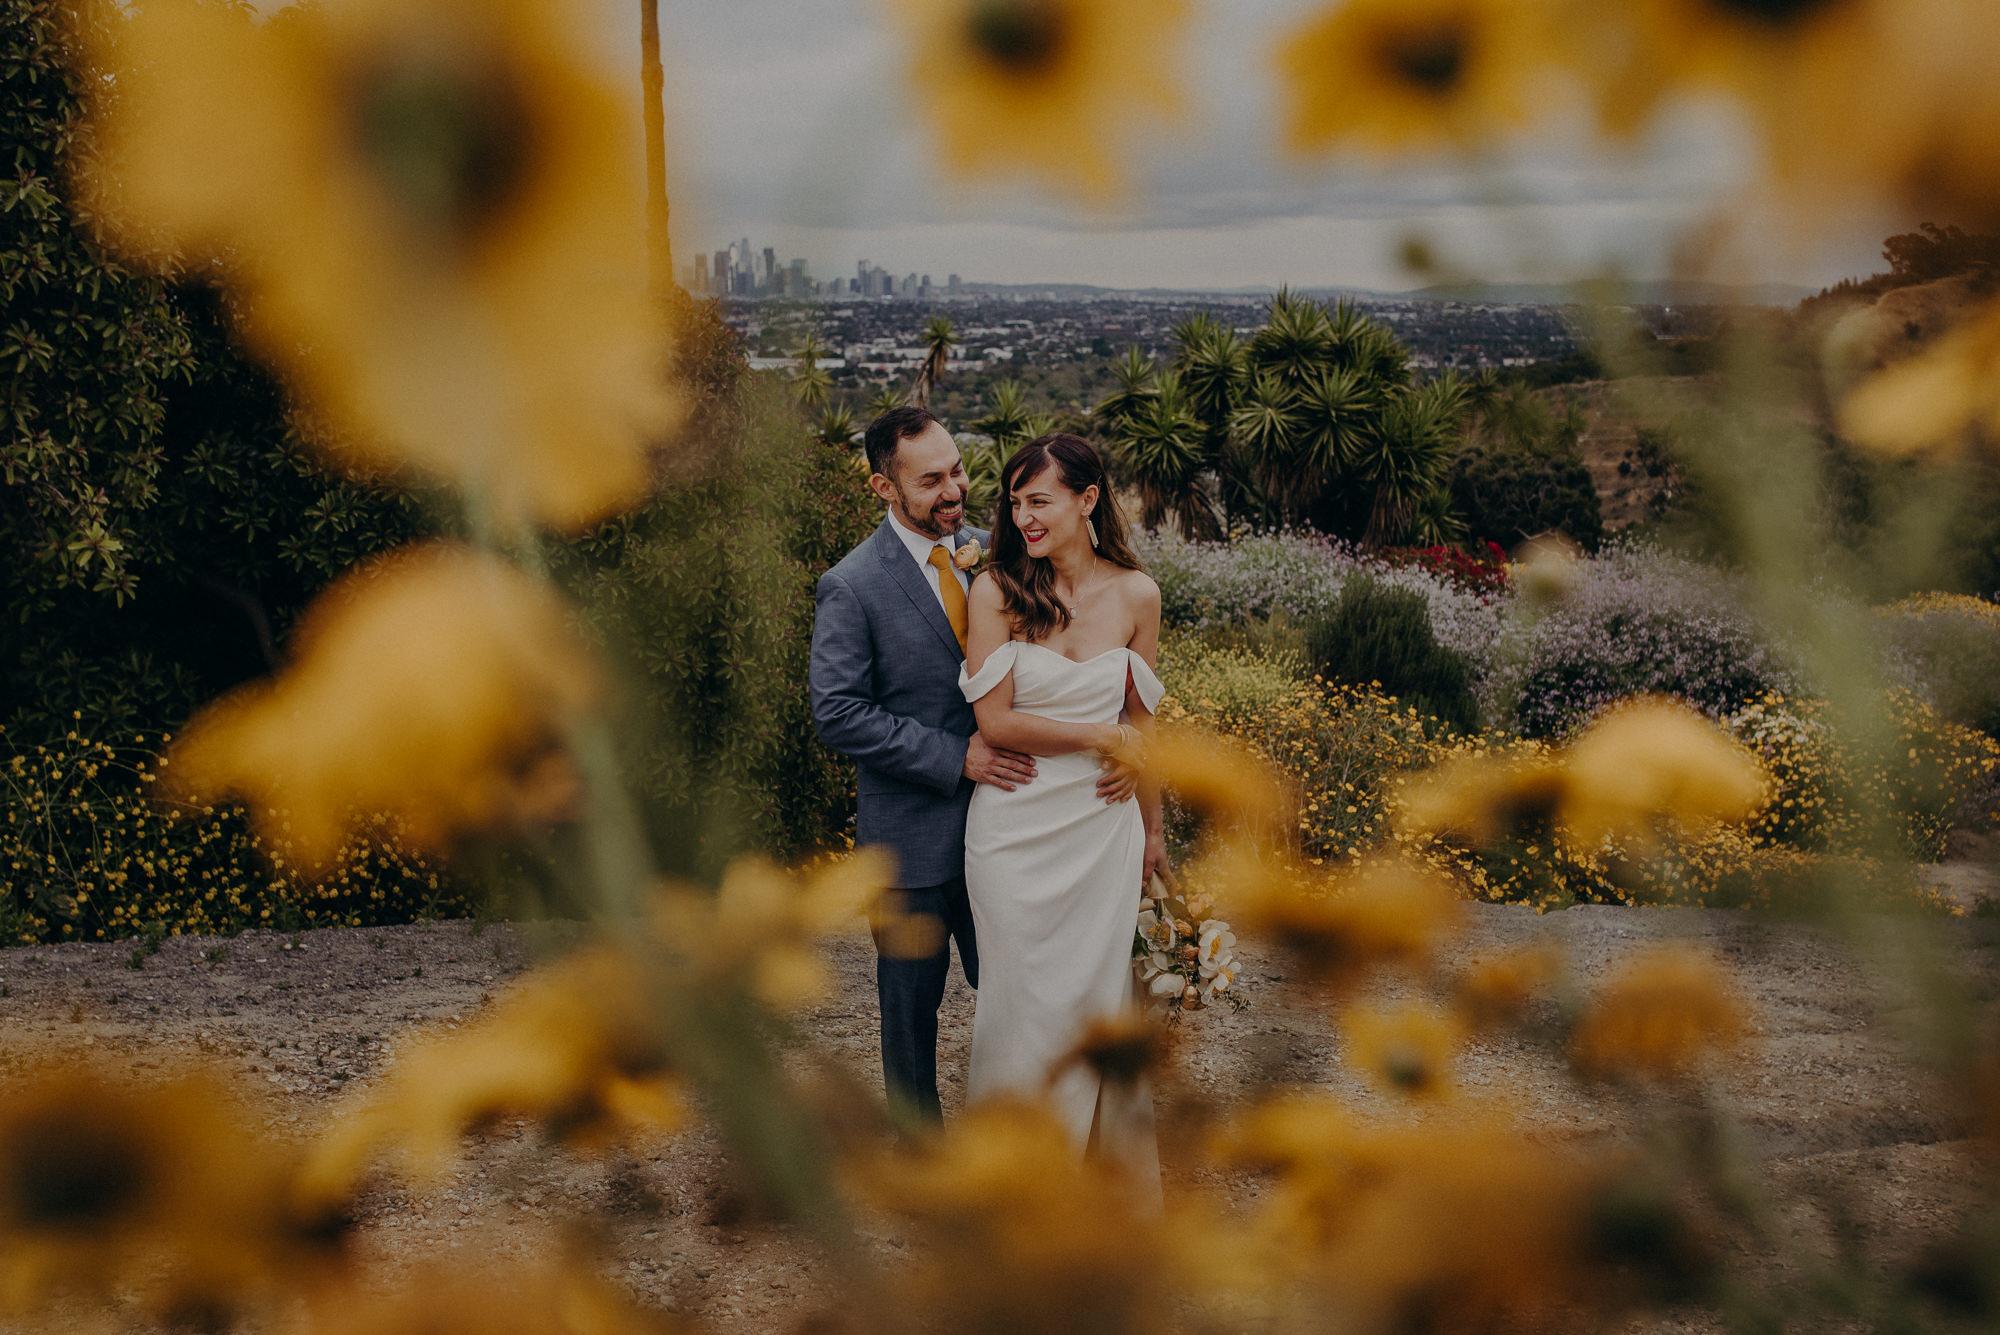 elopement photographer in los angeles - la wedding photographer - isaiahandtaylor.com-024.jpg